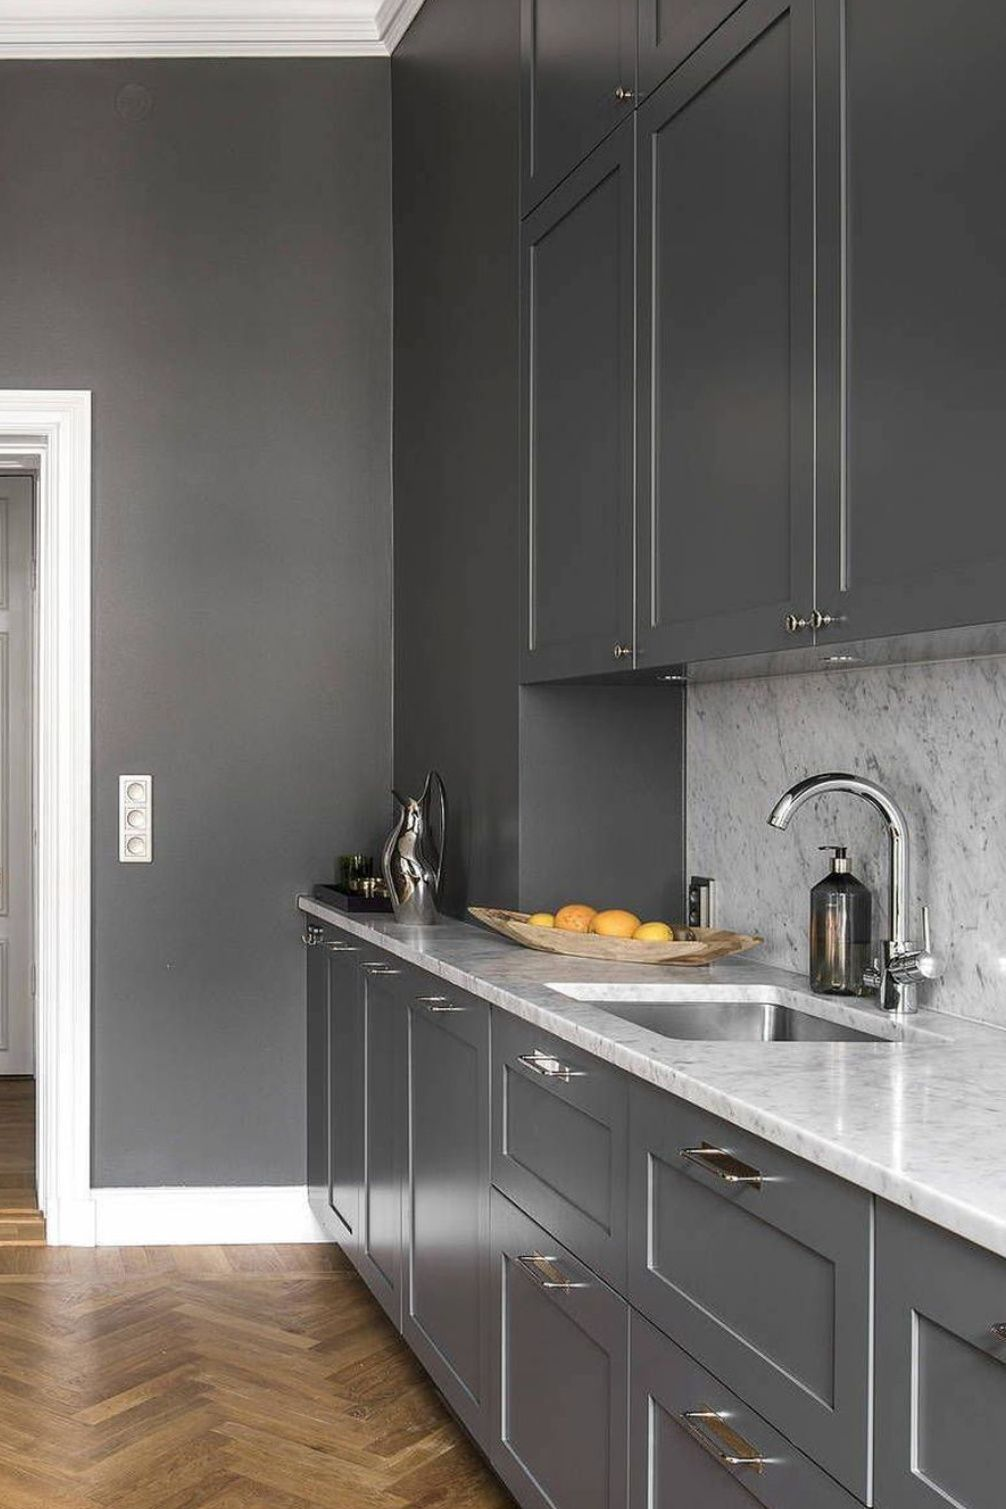 9+ Images Neutral Kitchen Paint Colors   Home Decor and Garden ...